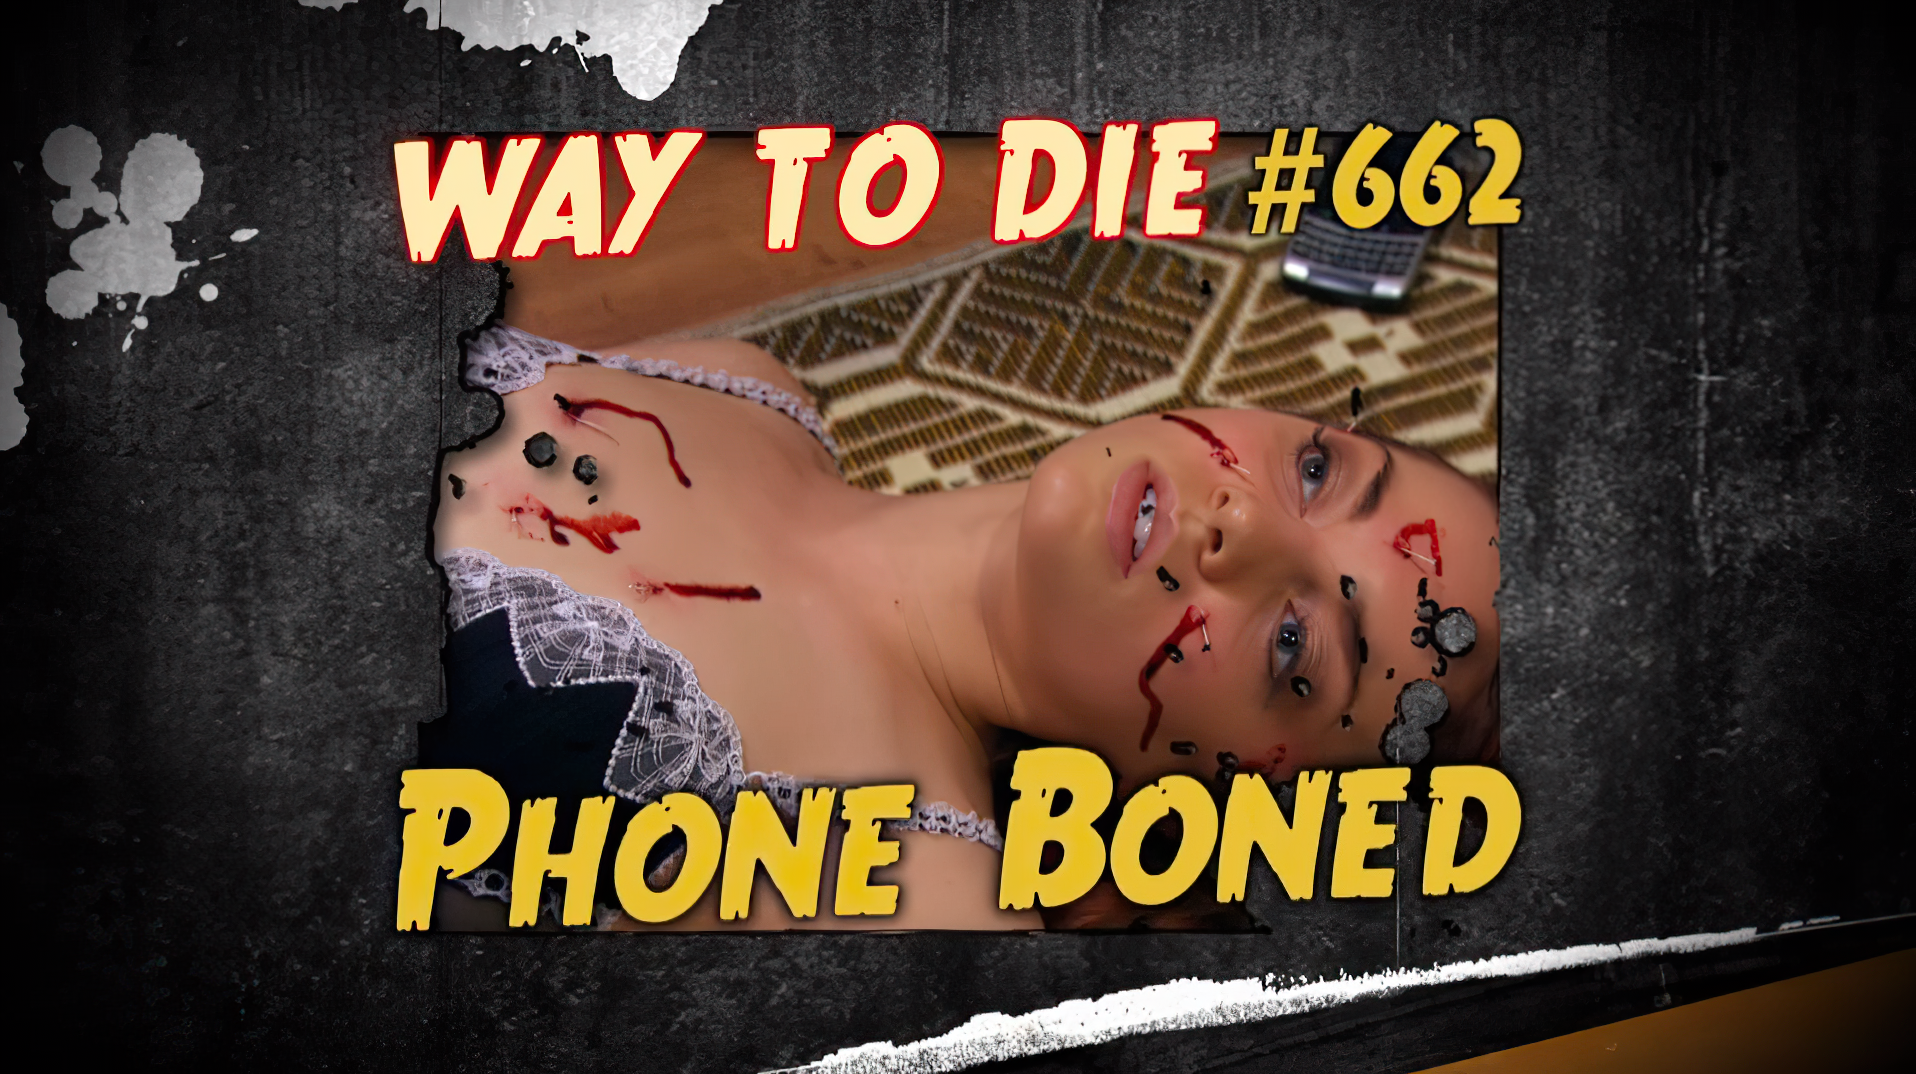 Phone Boned